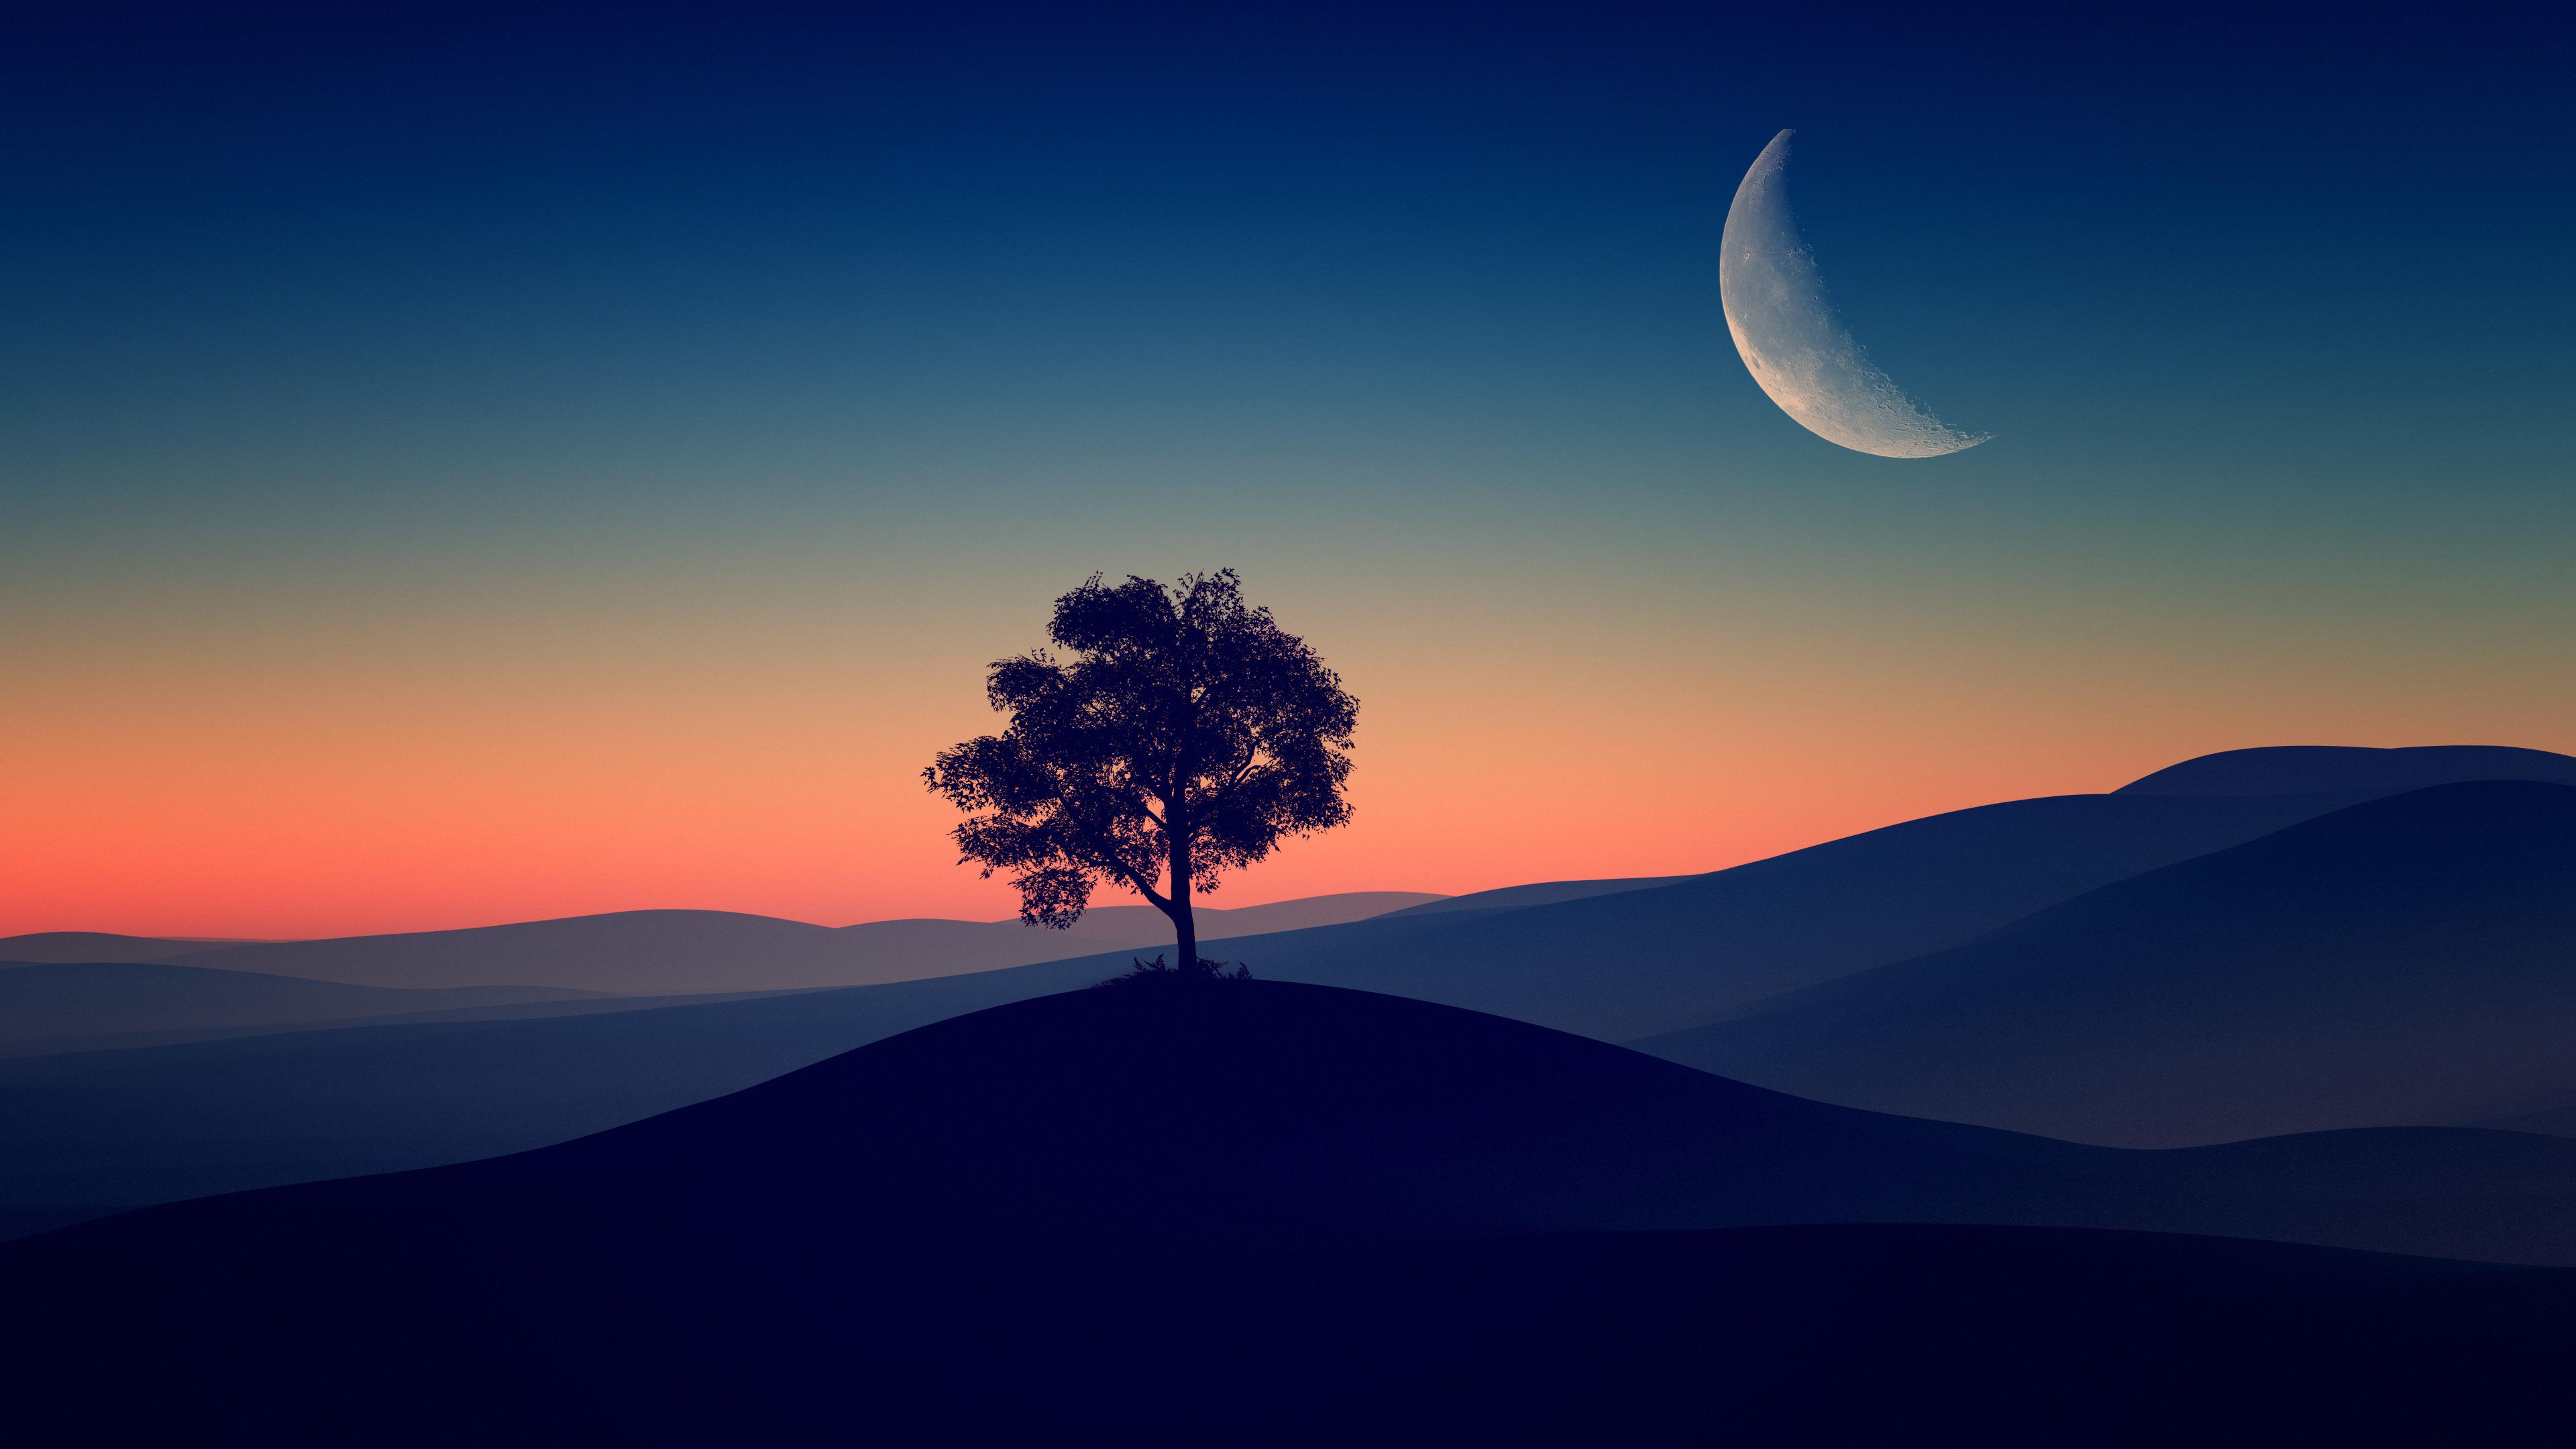 tree alone dark evening 4k 1602501593 - Tree Alone Dark Evening 4k - Tree Alone Dark Evening 4k wallpapers